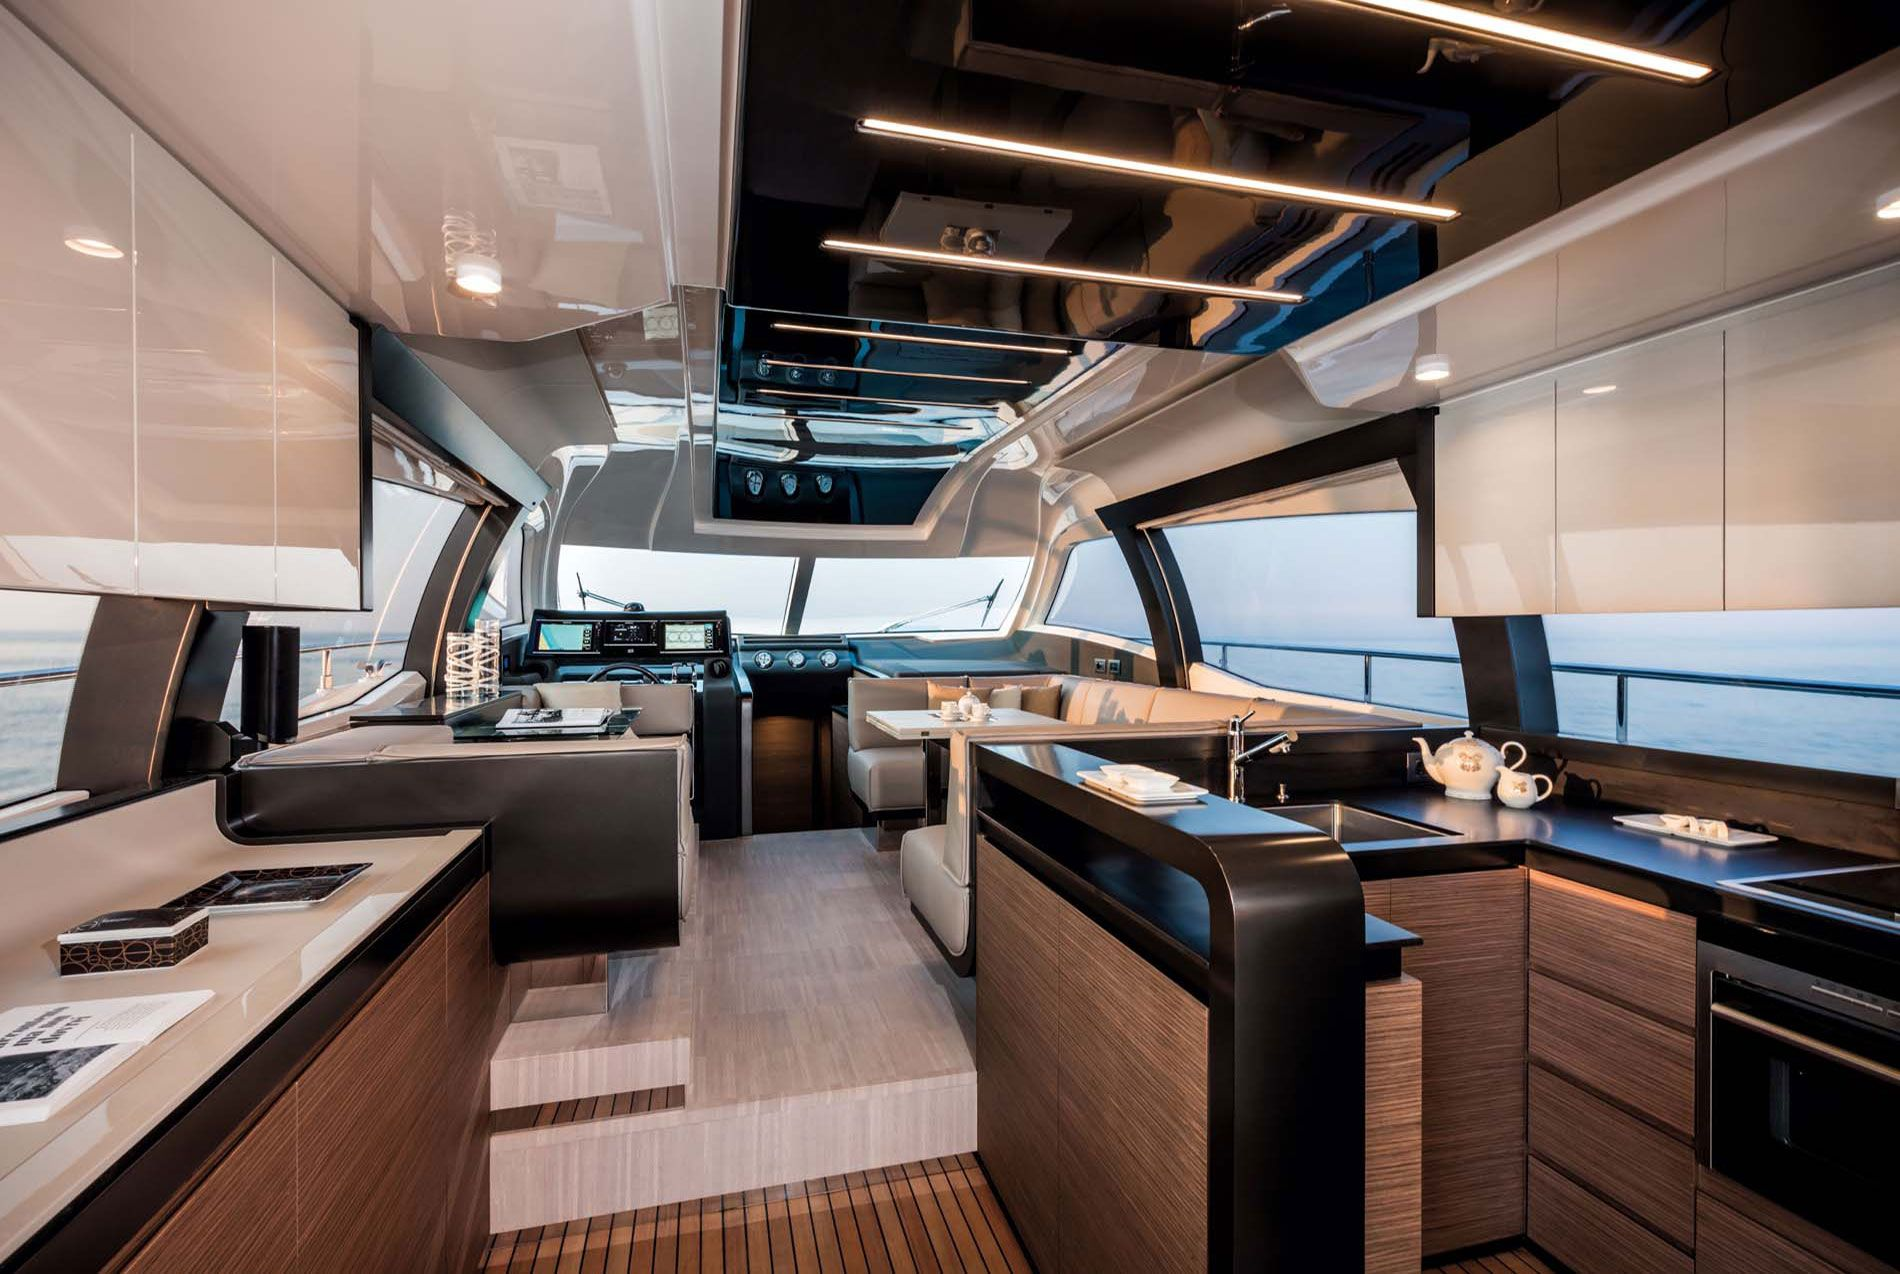 Ferretti yacht 550 stunning interior design boats luxury